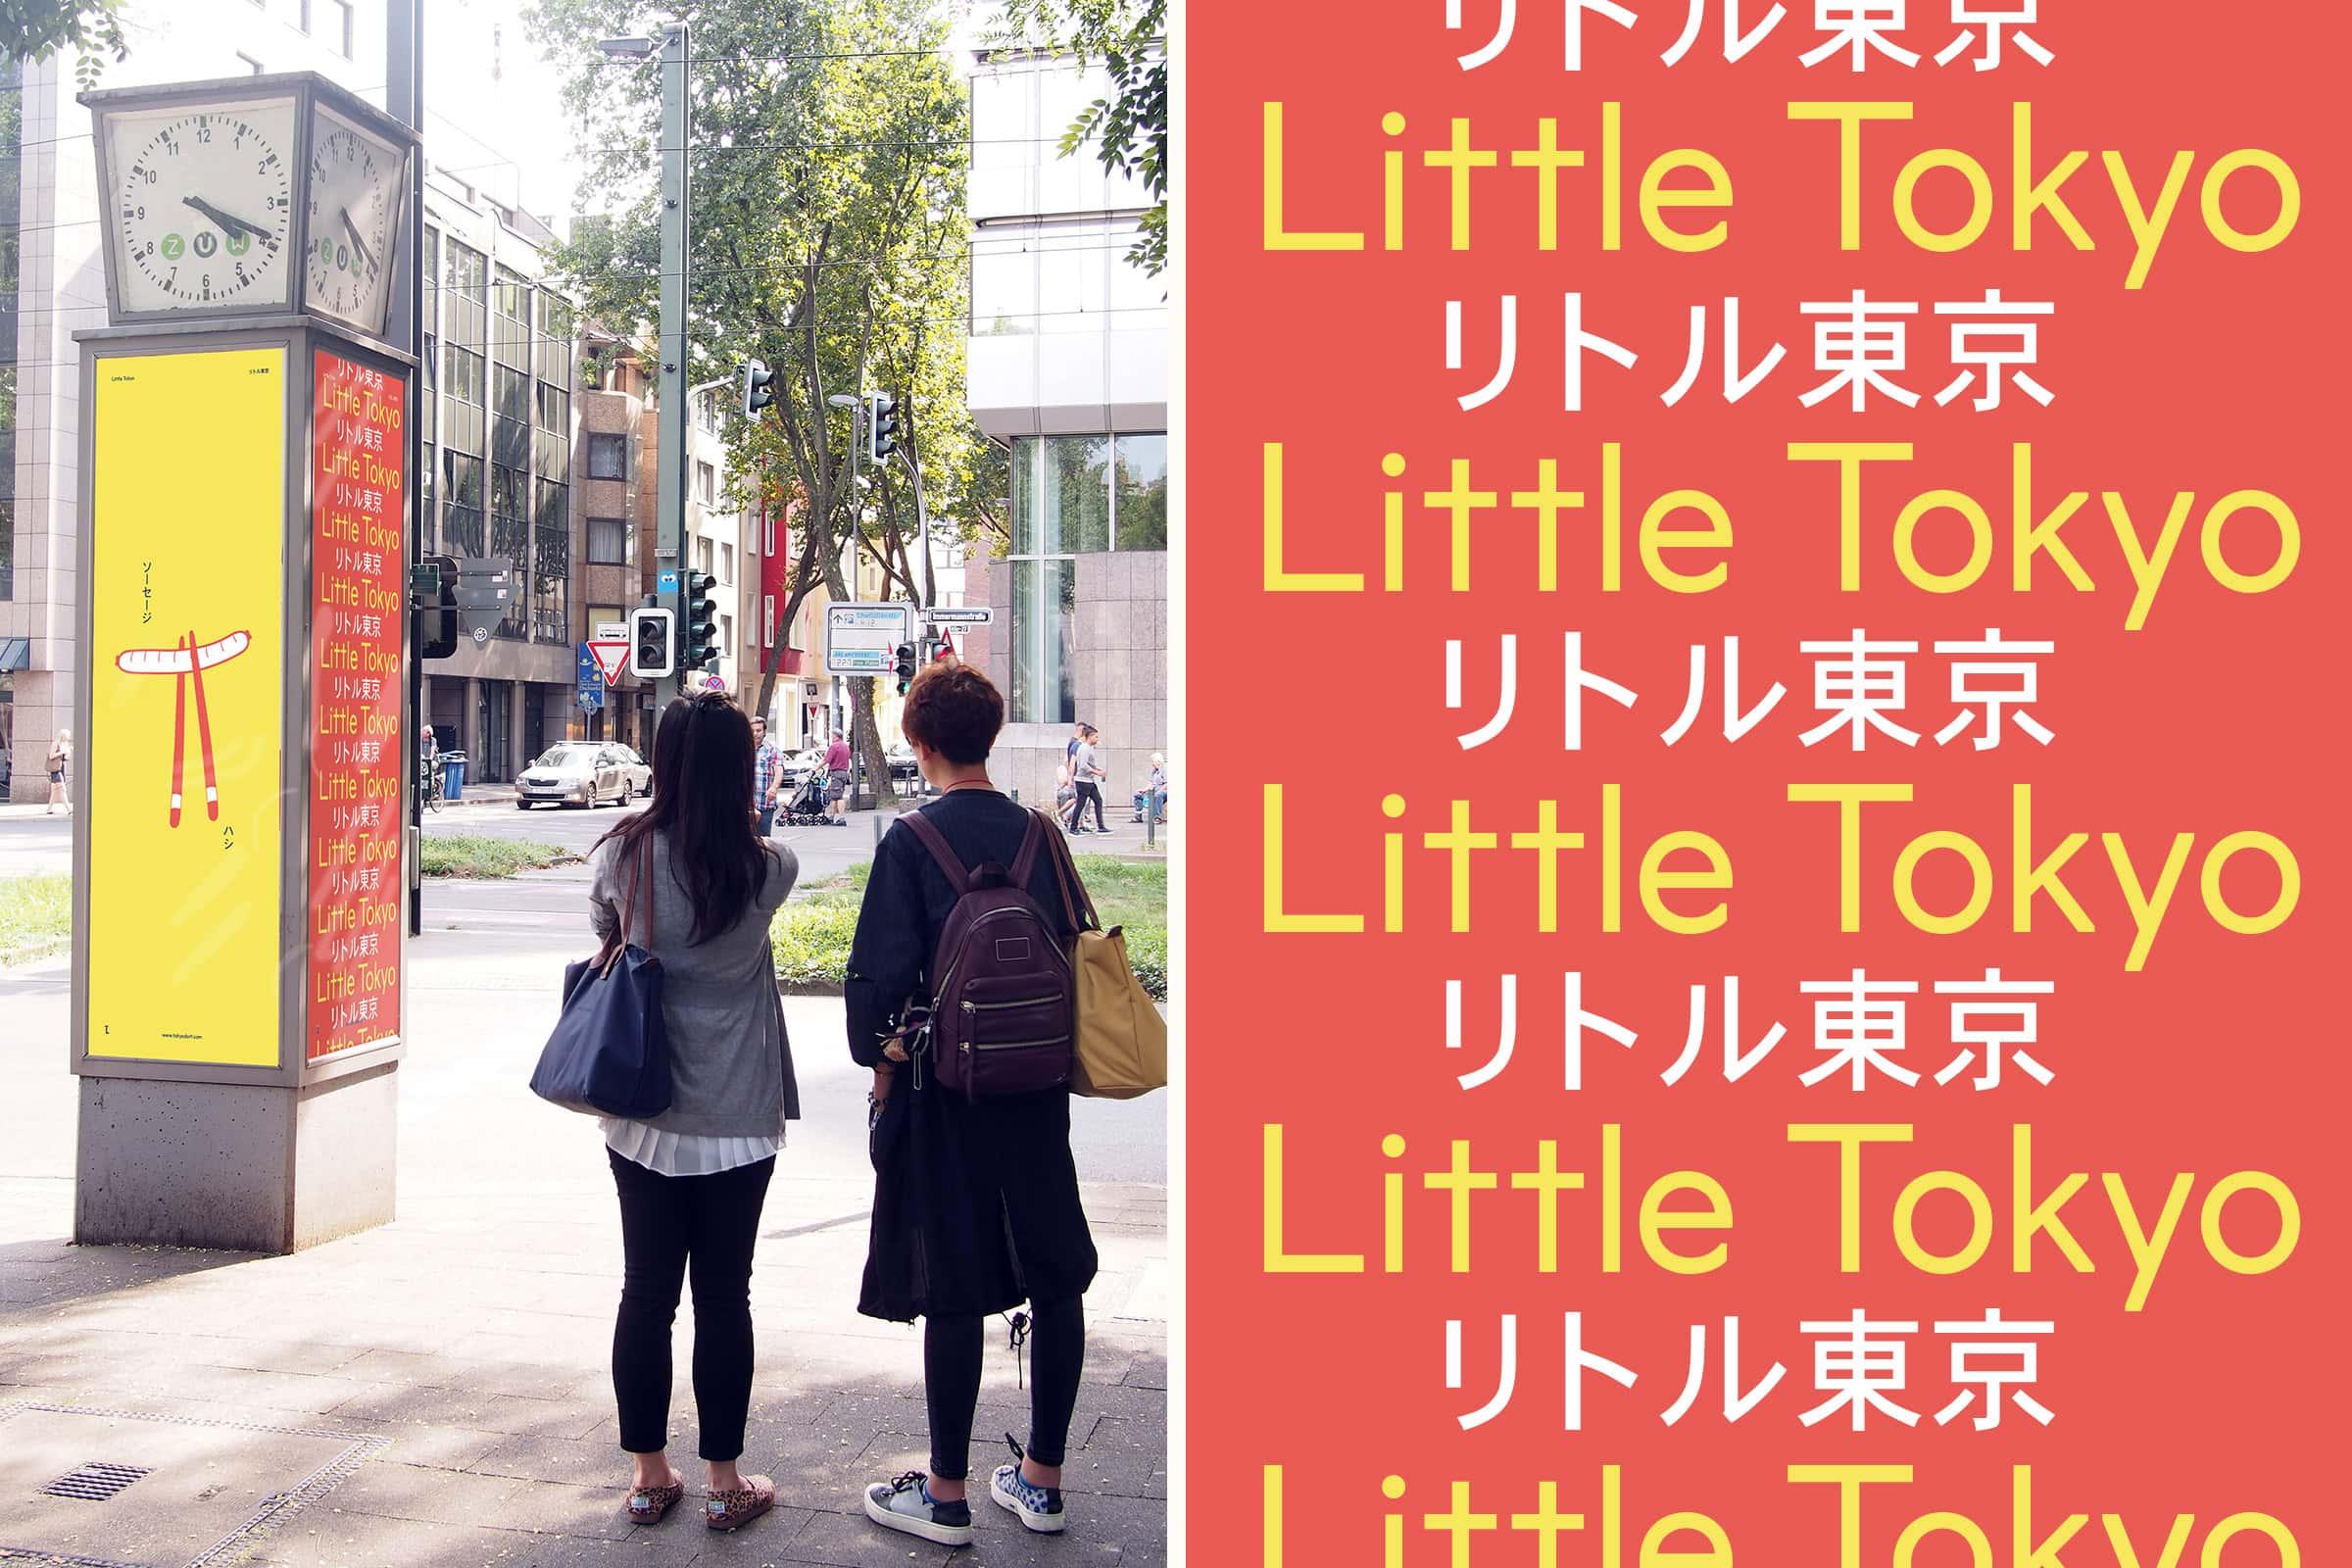 LittleTokyo, Düsseldorf, Japantown, Städte Branding, Werbekampagne